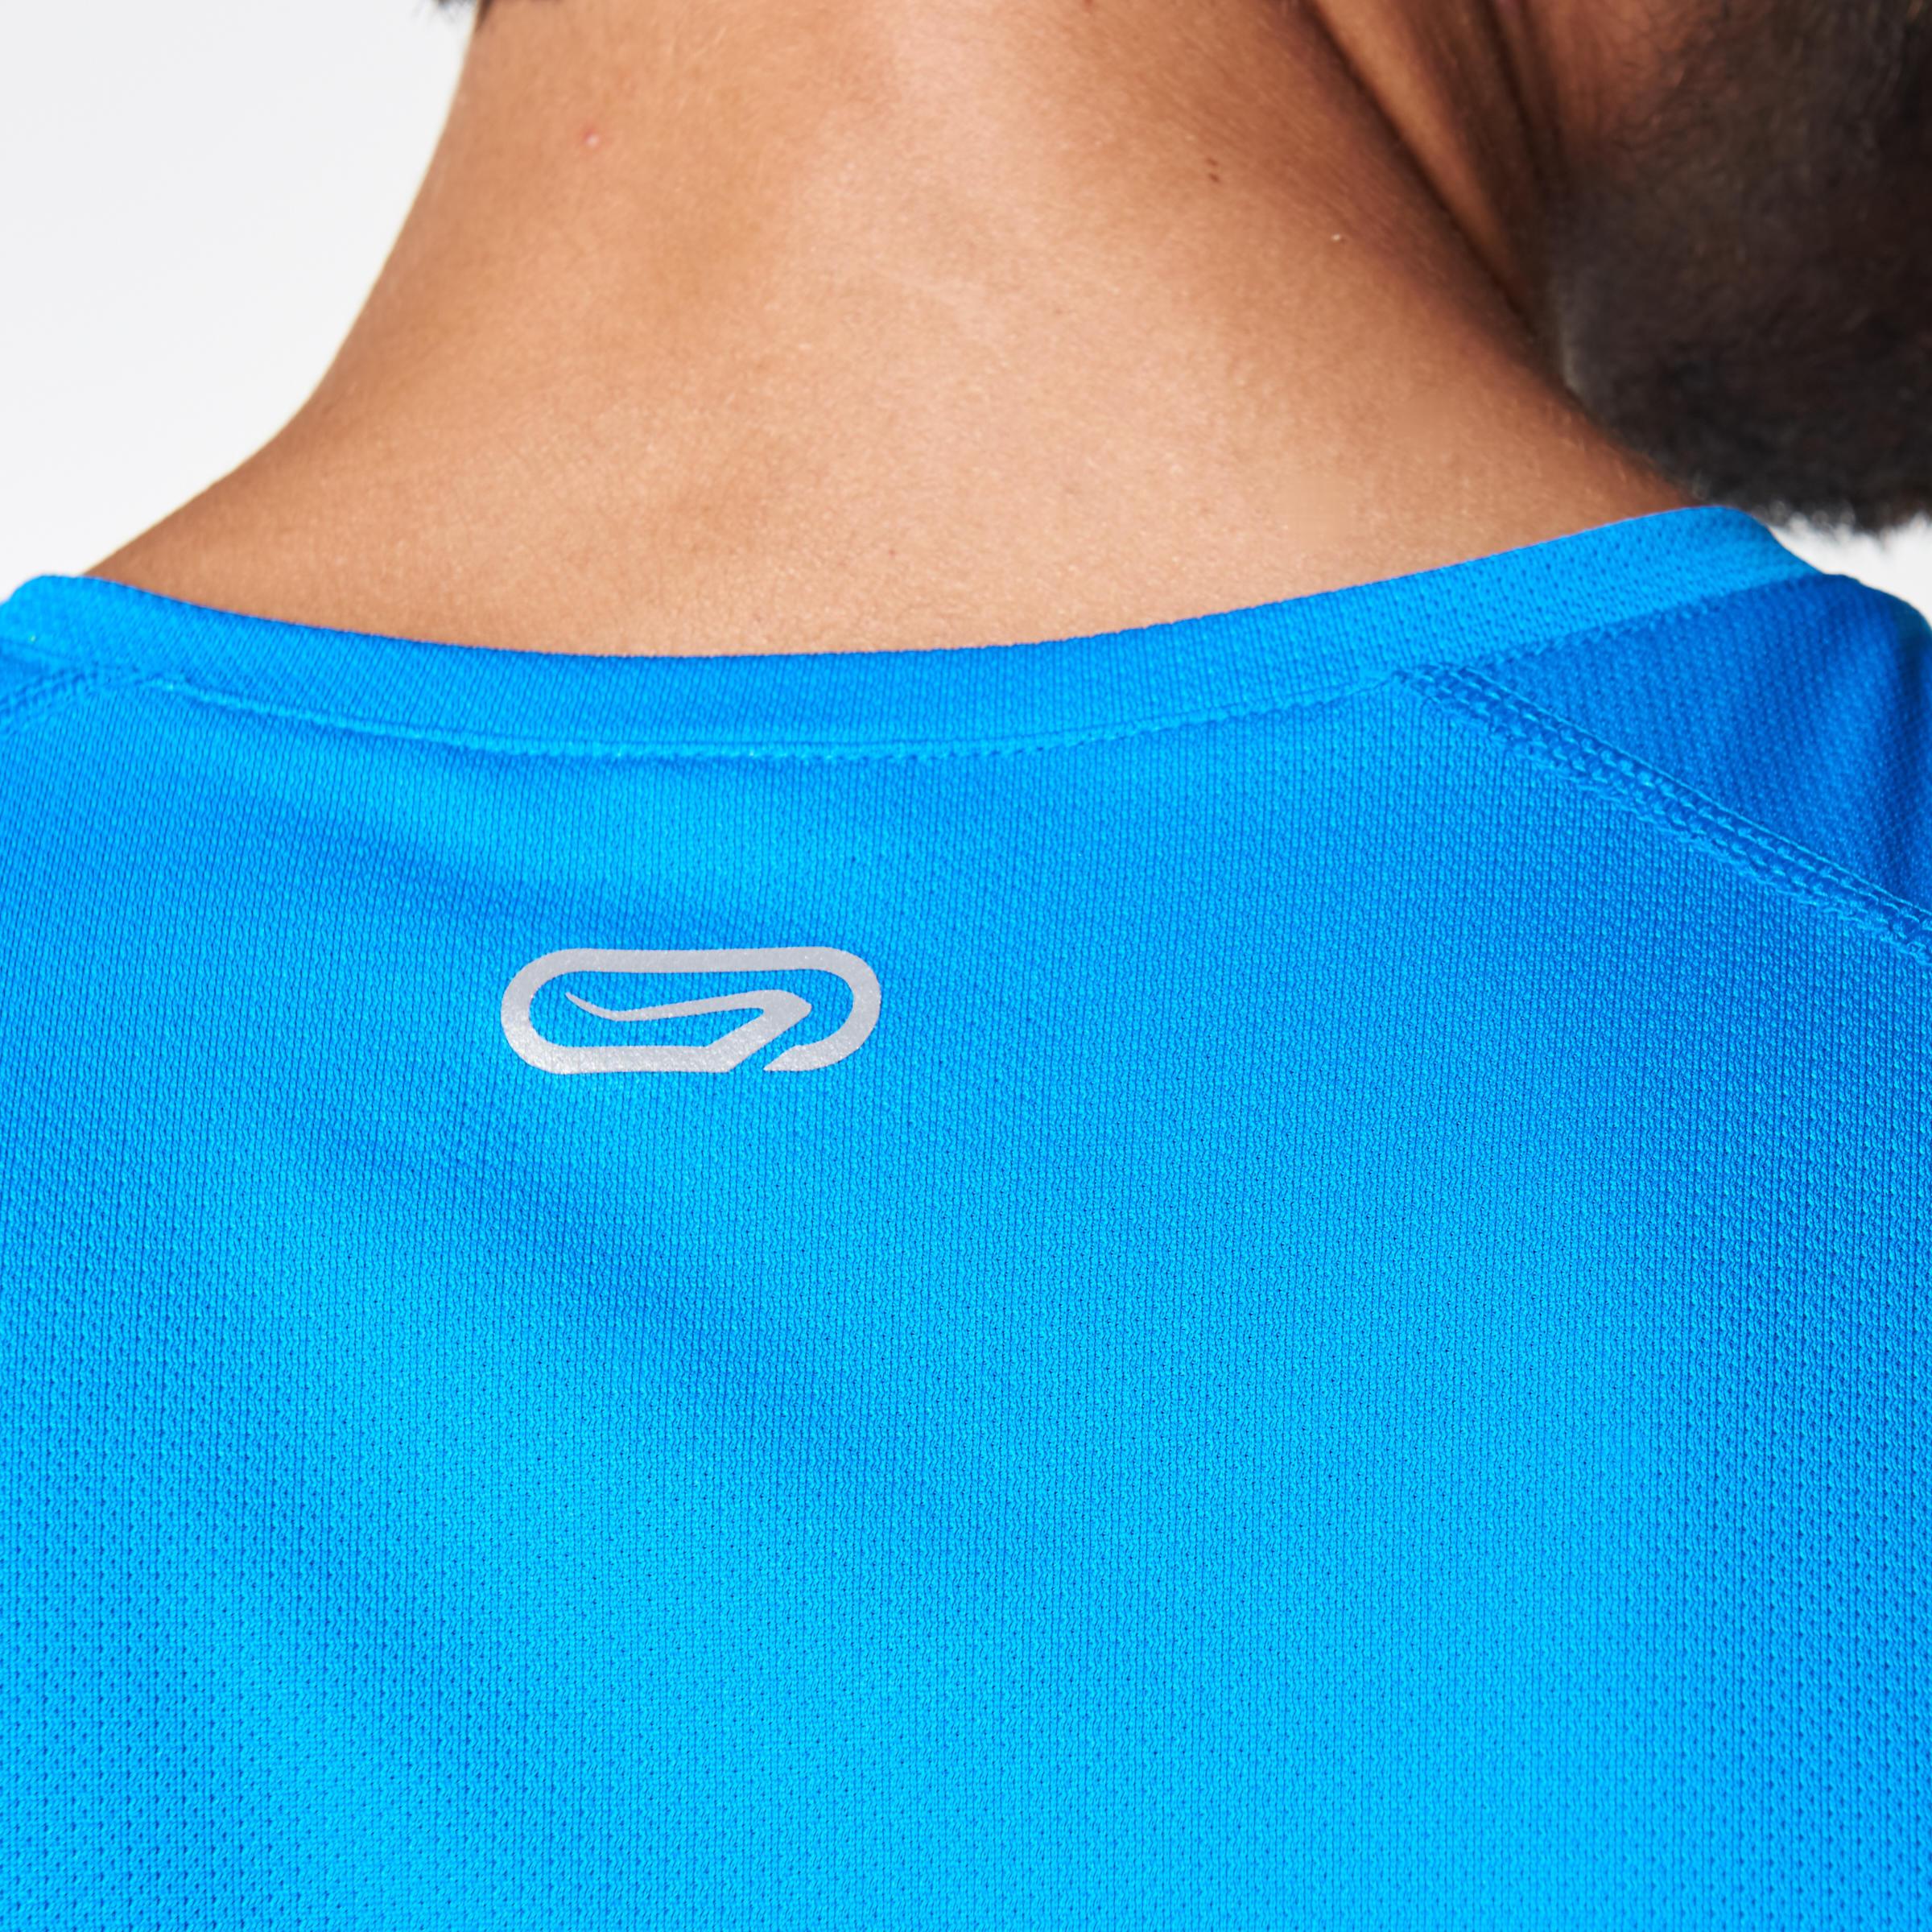 RUN DRY MEN'S RUNNING T-SHIRT BLUE